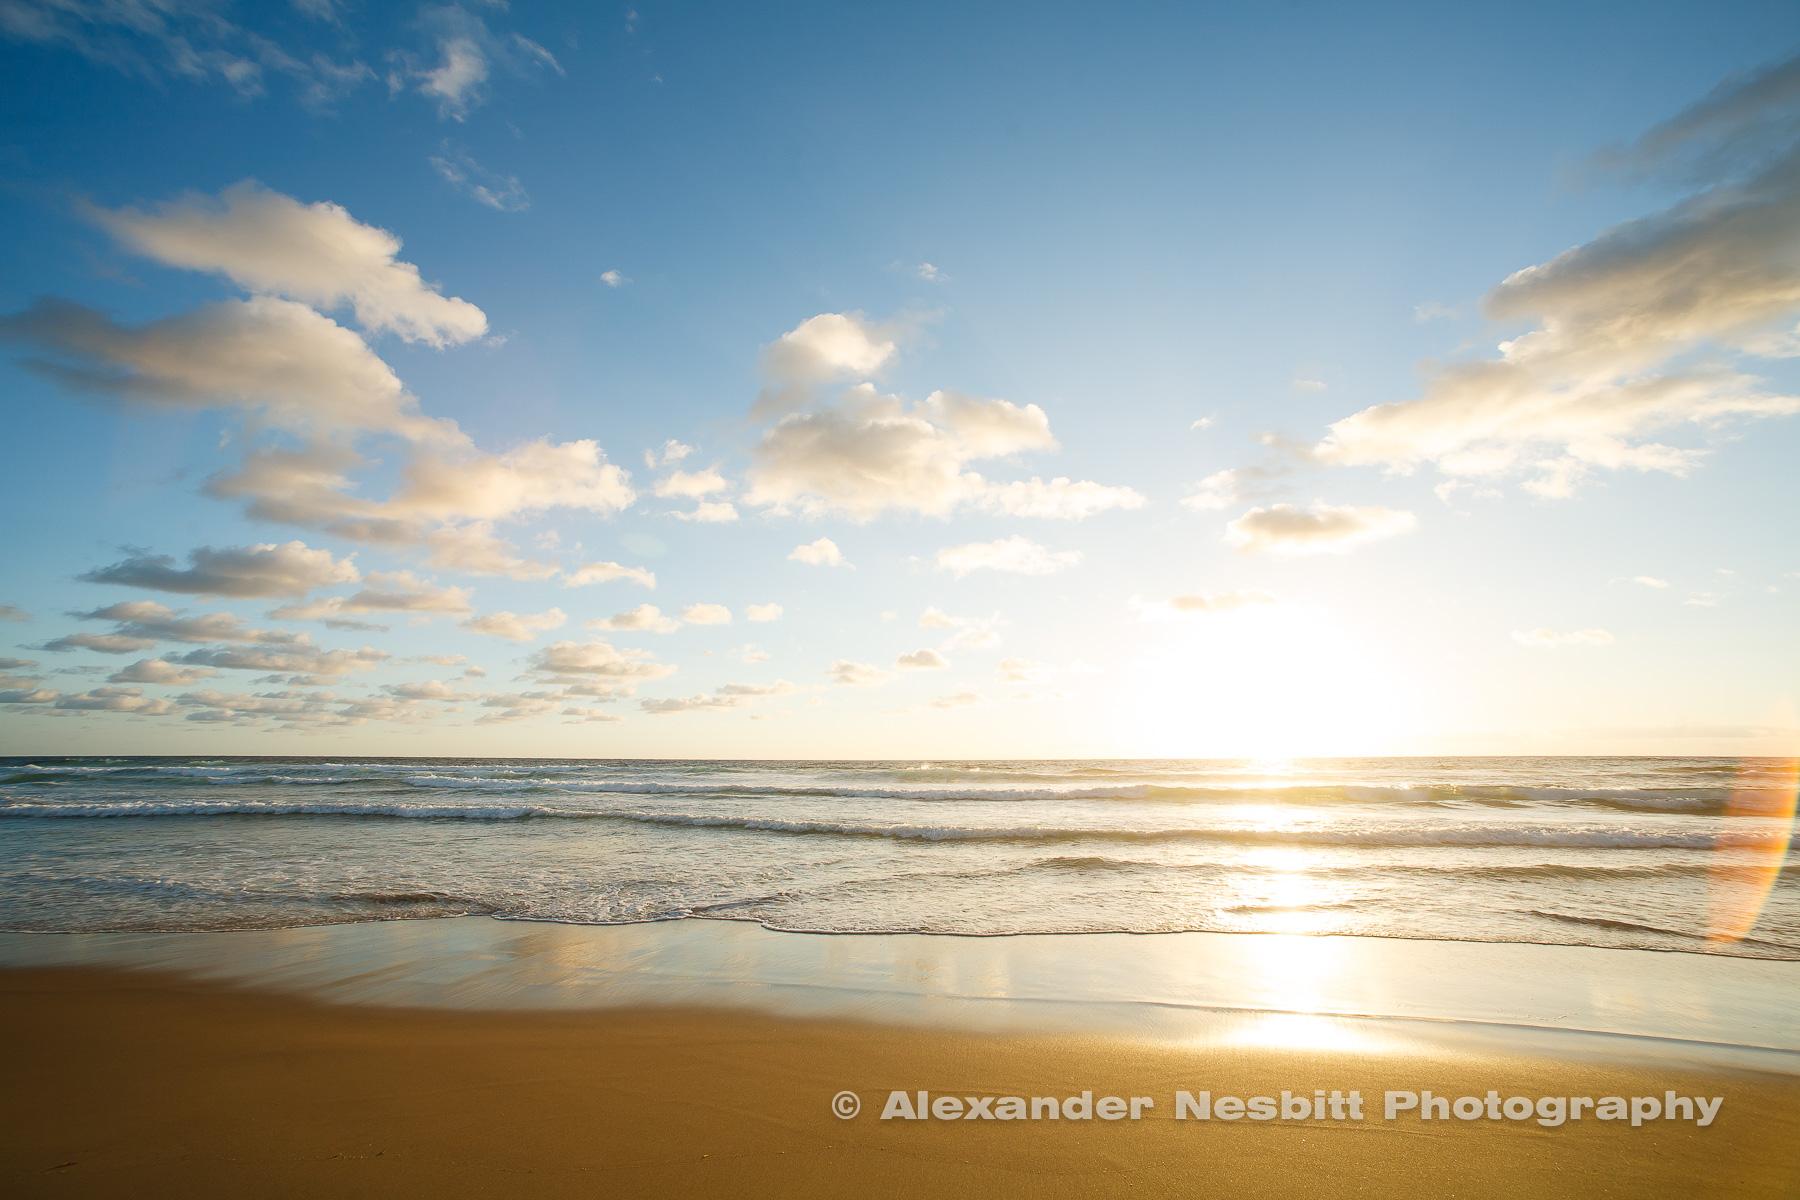 Tofo Beach on the Indian Ocean, Mozambique